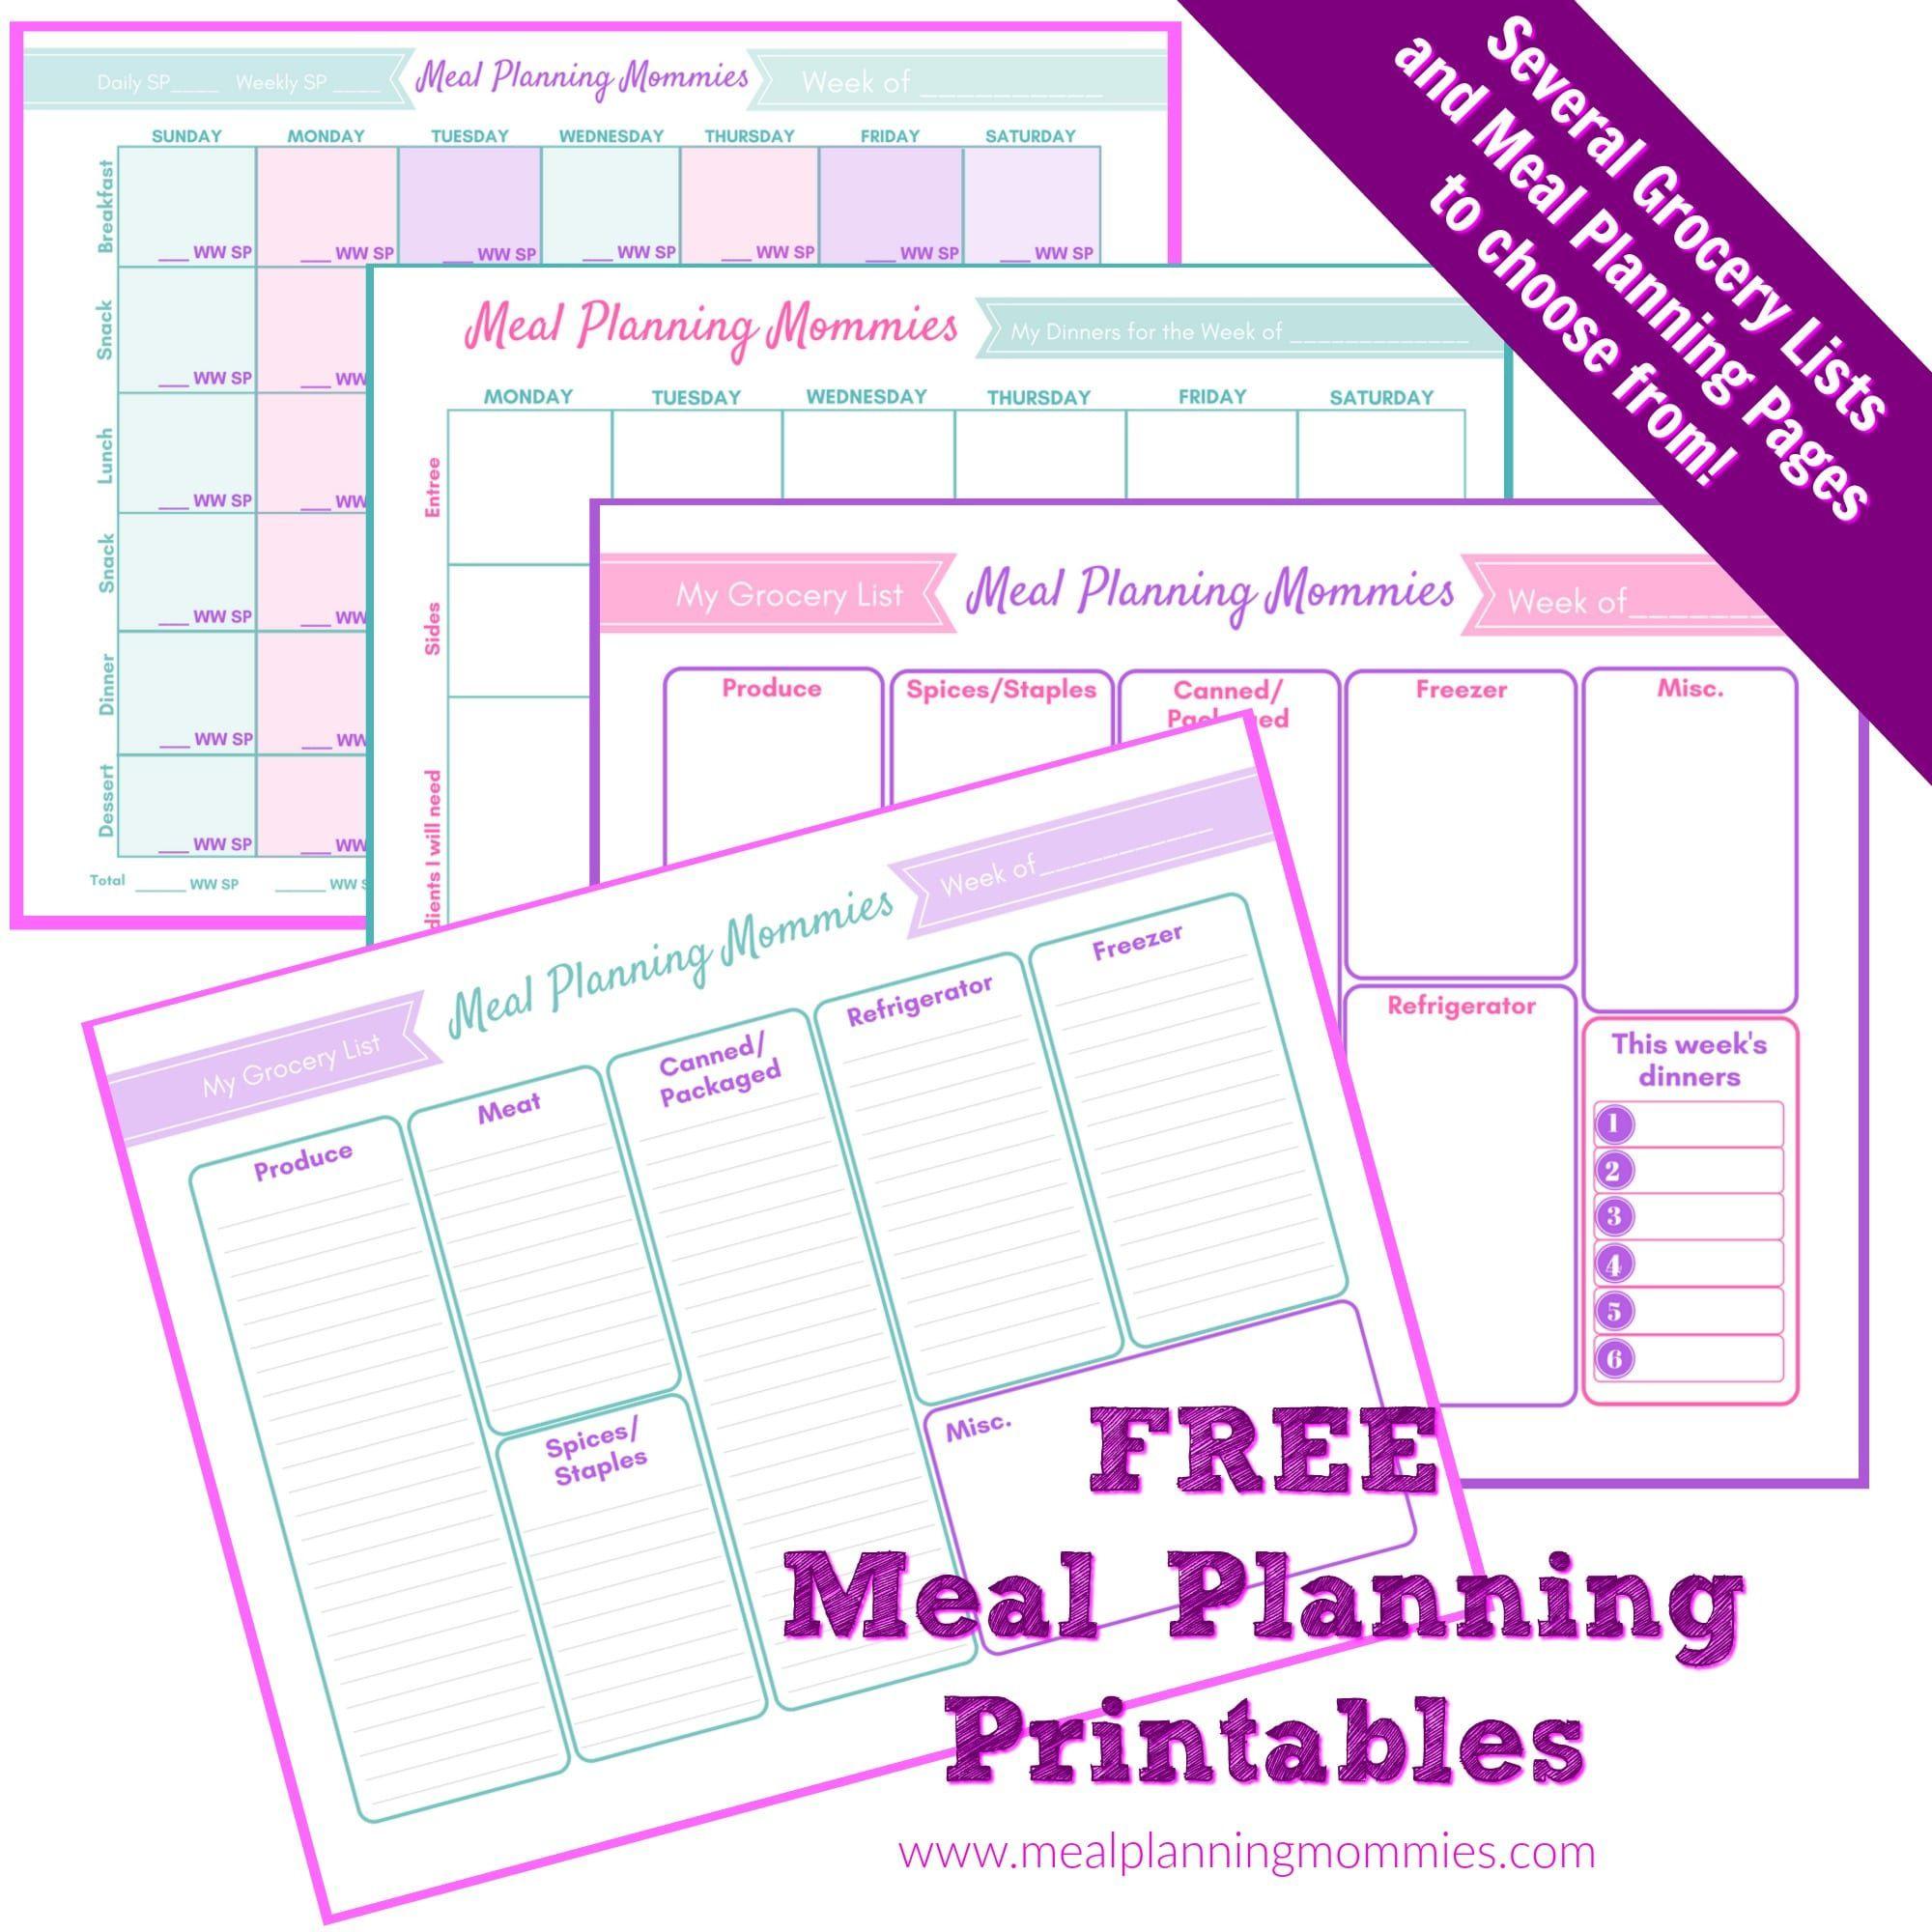 006 Unusual Weekly Meal Planning Worksheet Pdf High Definition  FreeFull